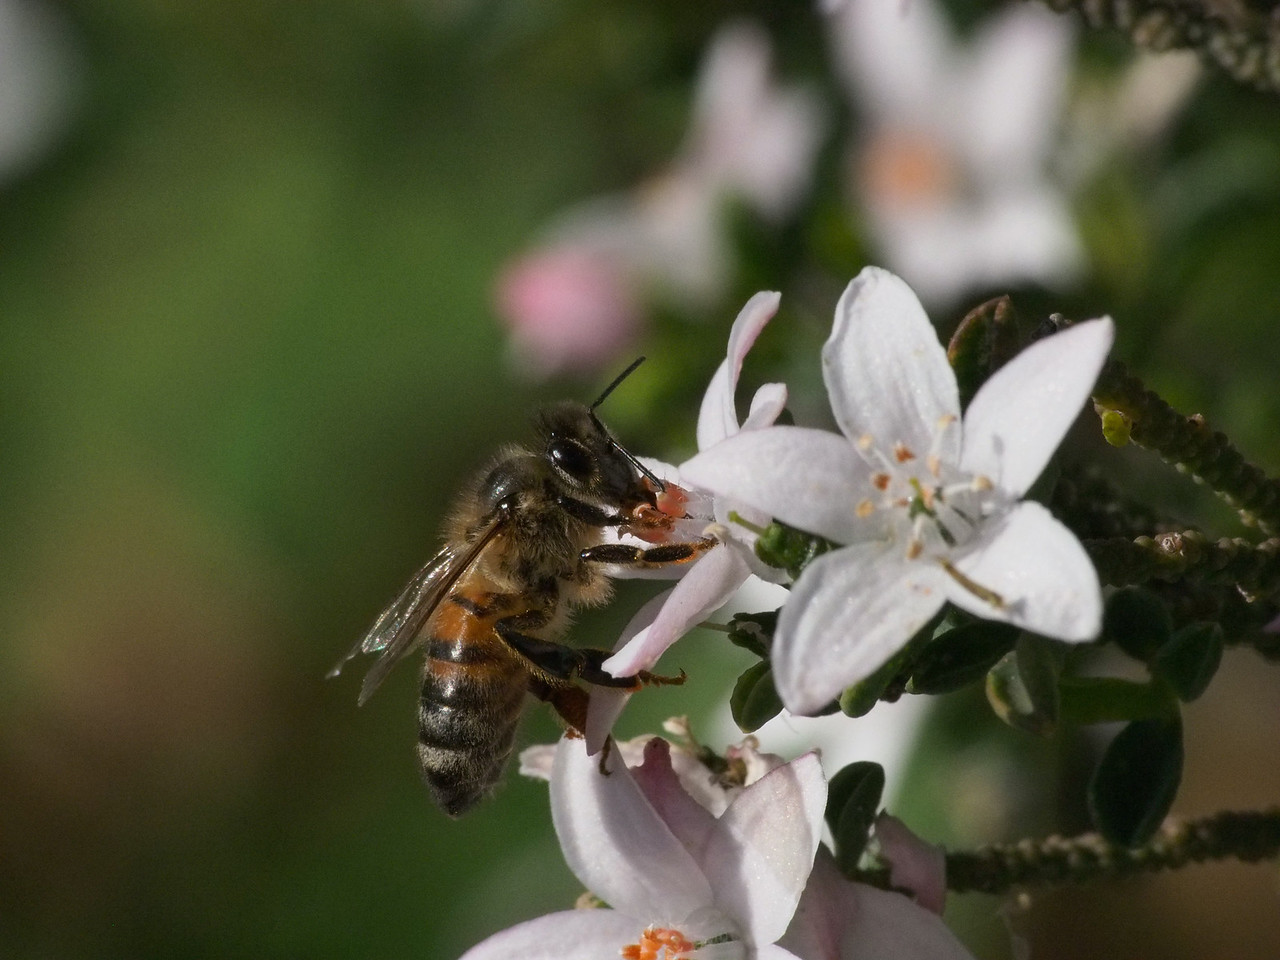 20130908_1449_2120 Kew Baptist bee